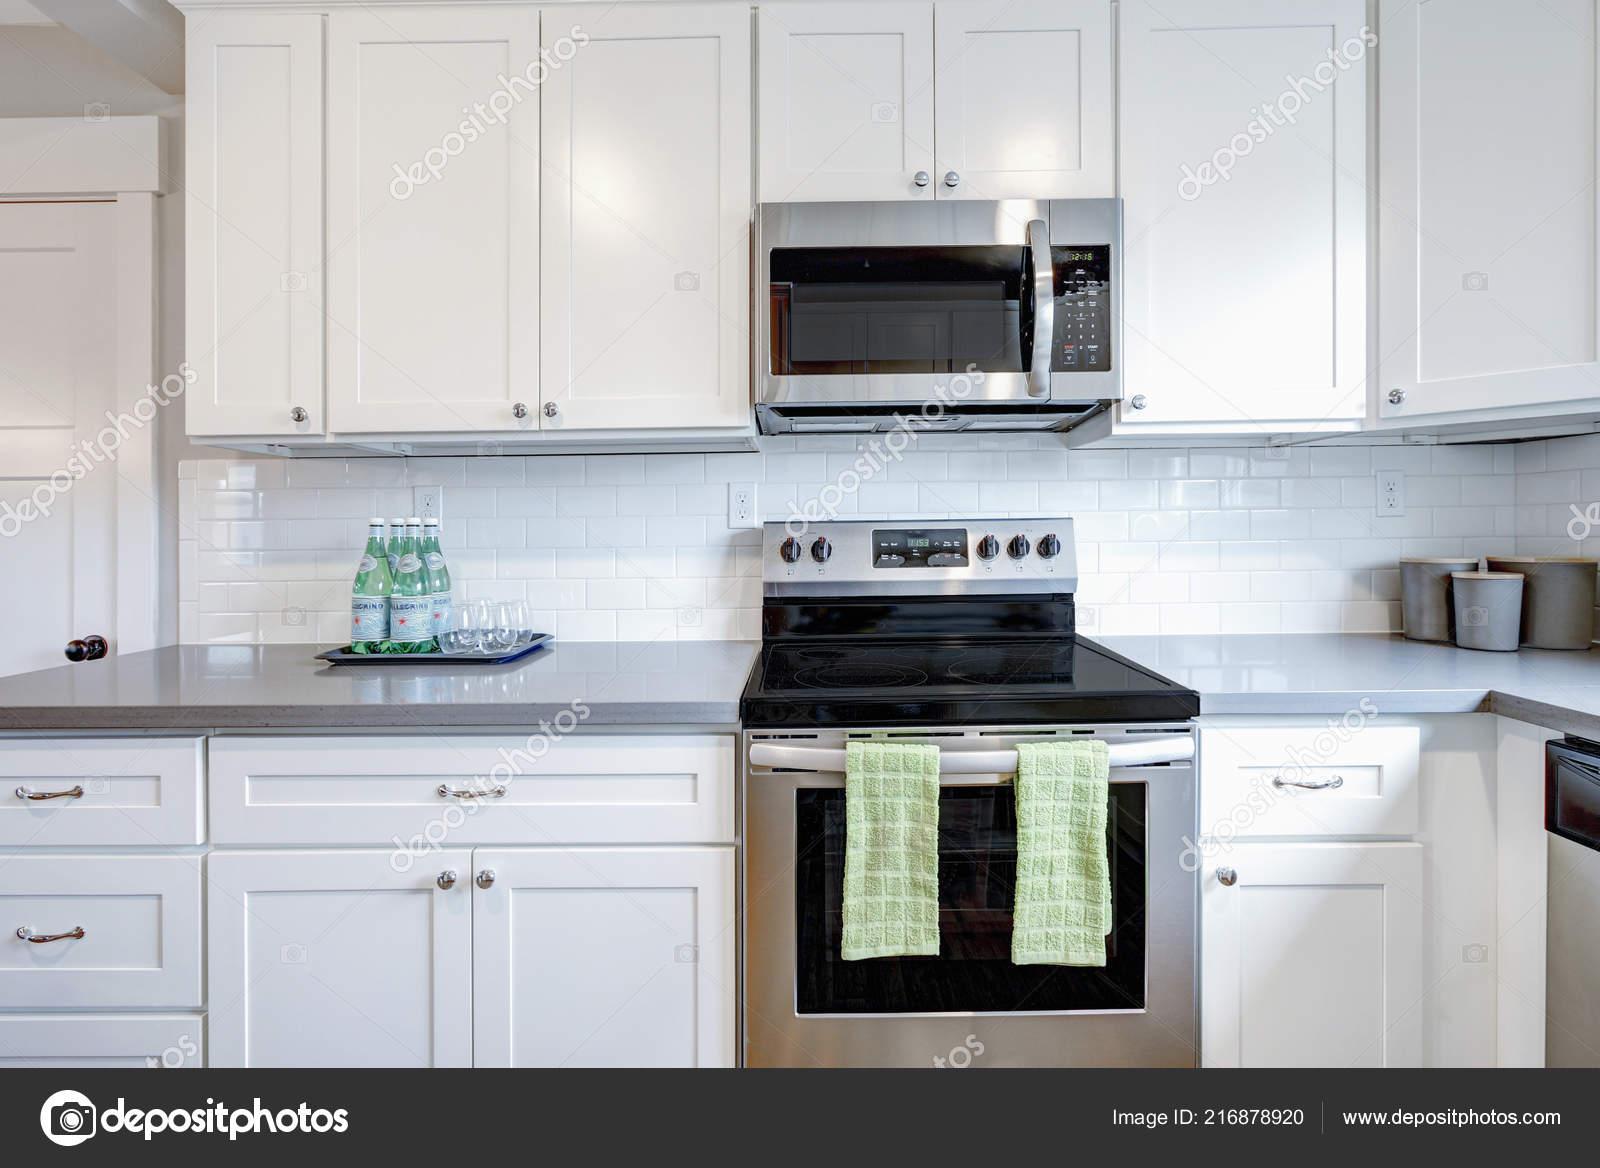 White Gray Kitchen Room Modern Stainless Steel Appliances